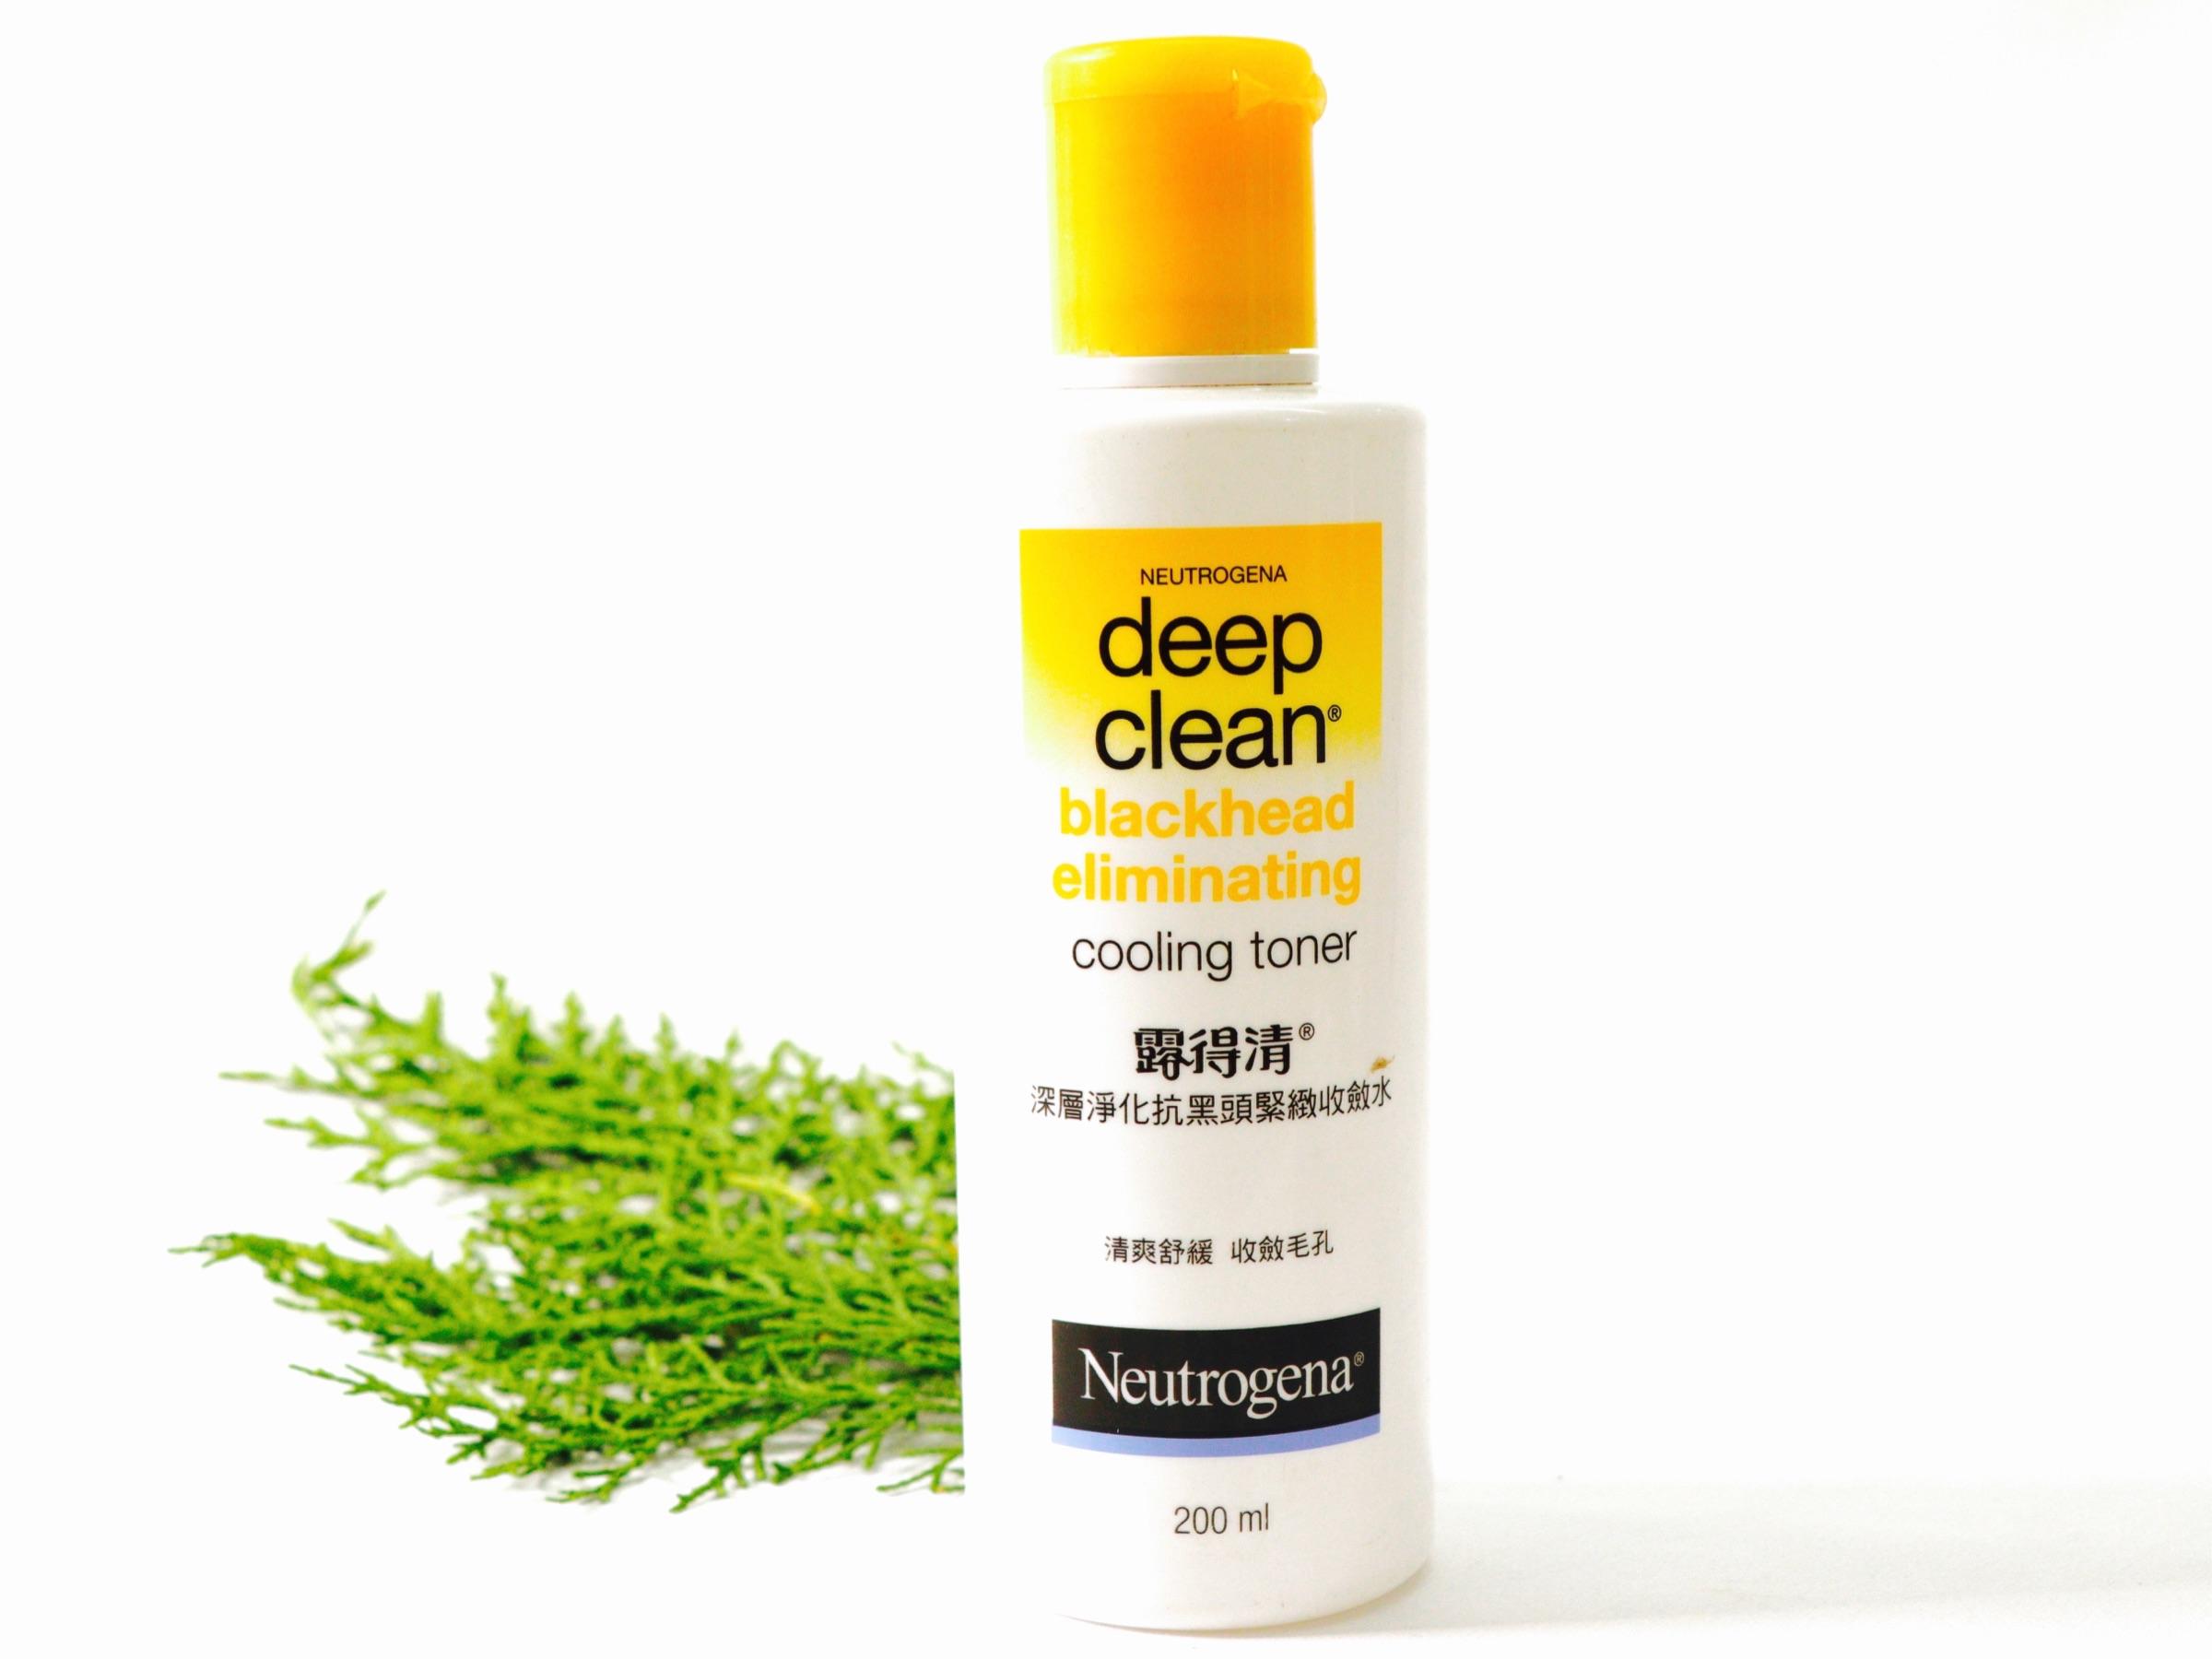 Neutrogena Deep Clean Blackhead Eliminating Cooling Toner Review